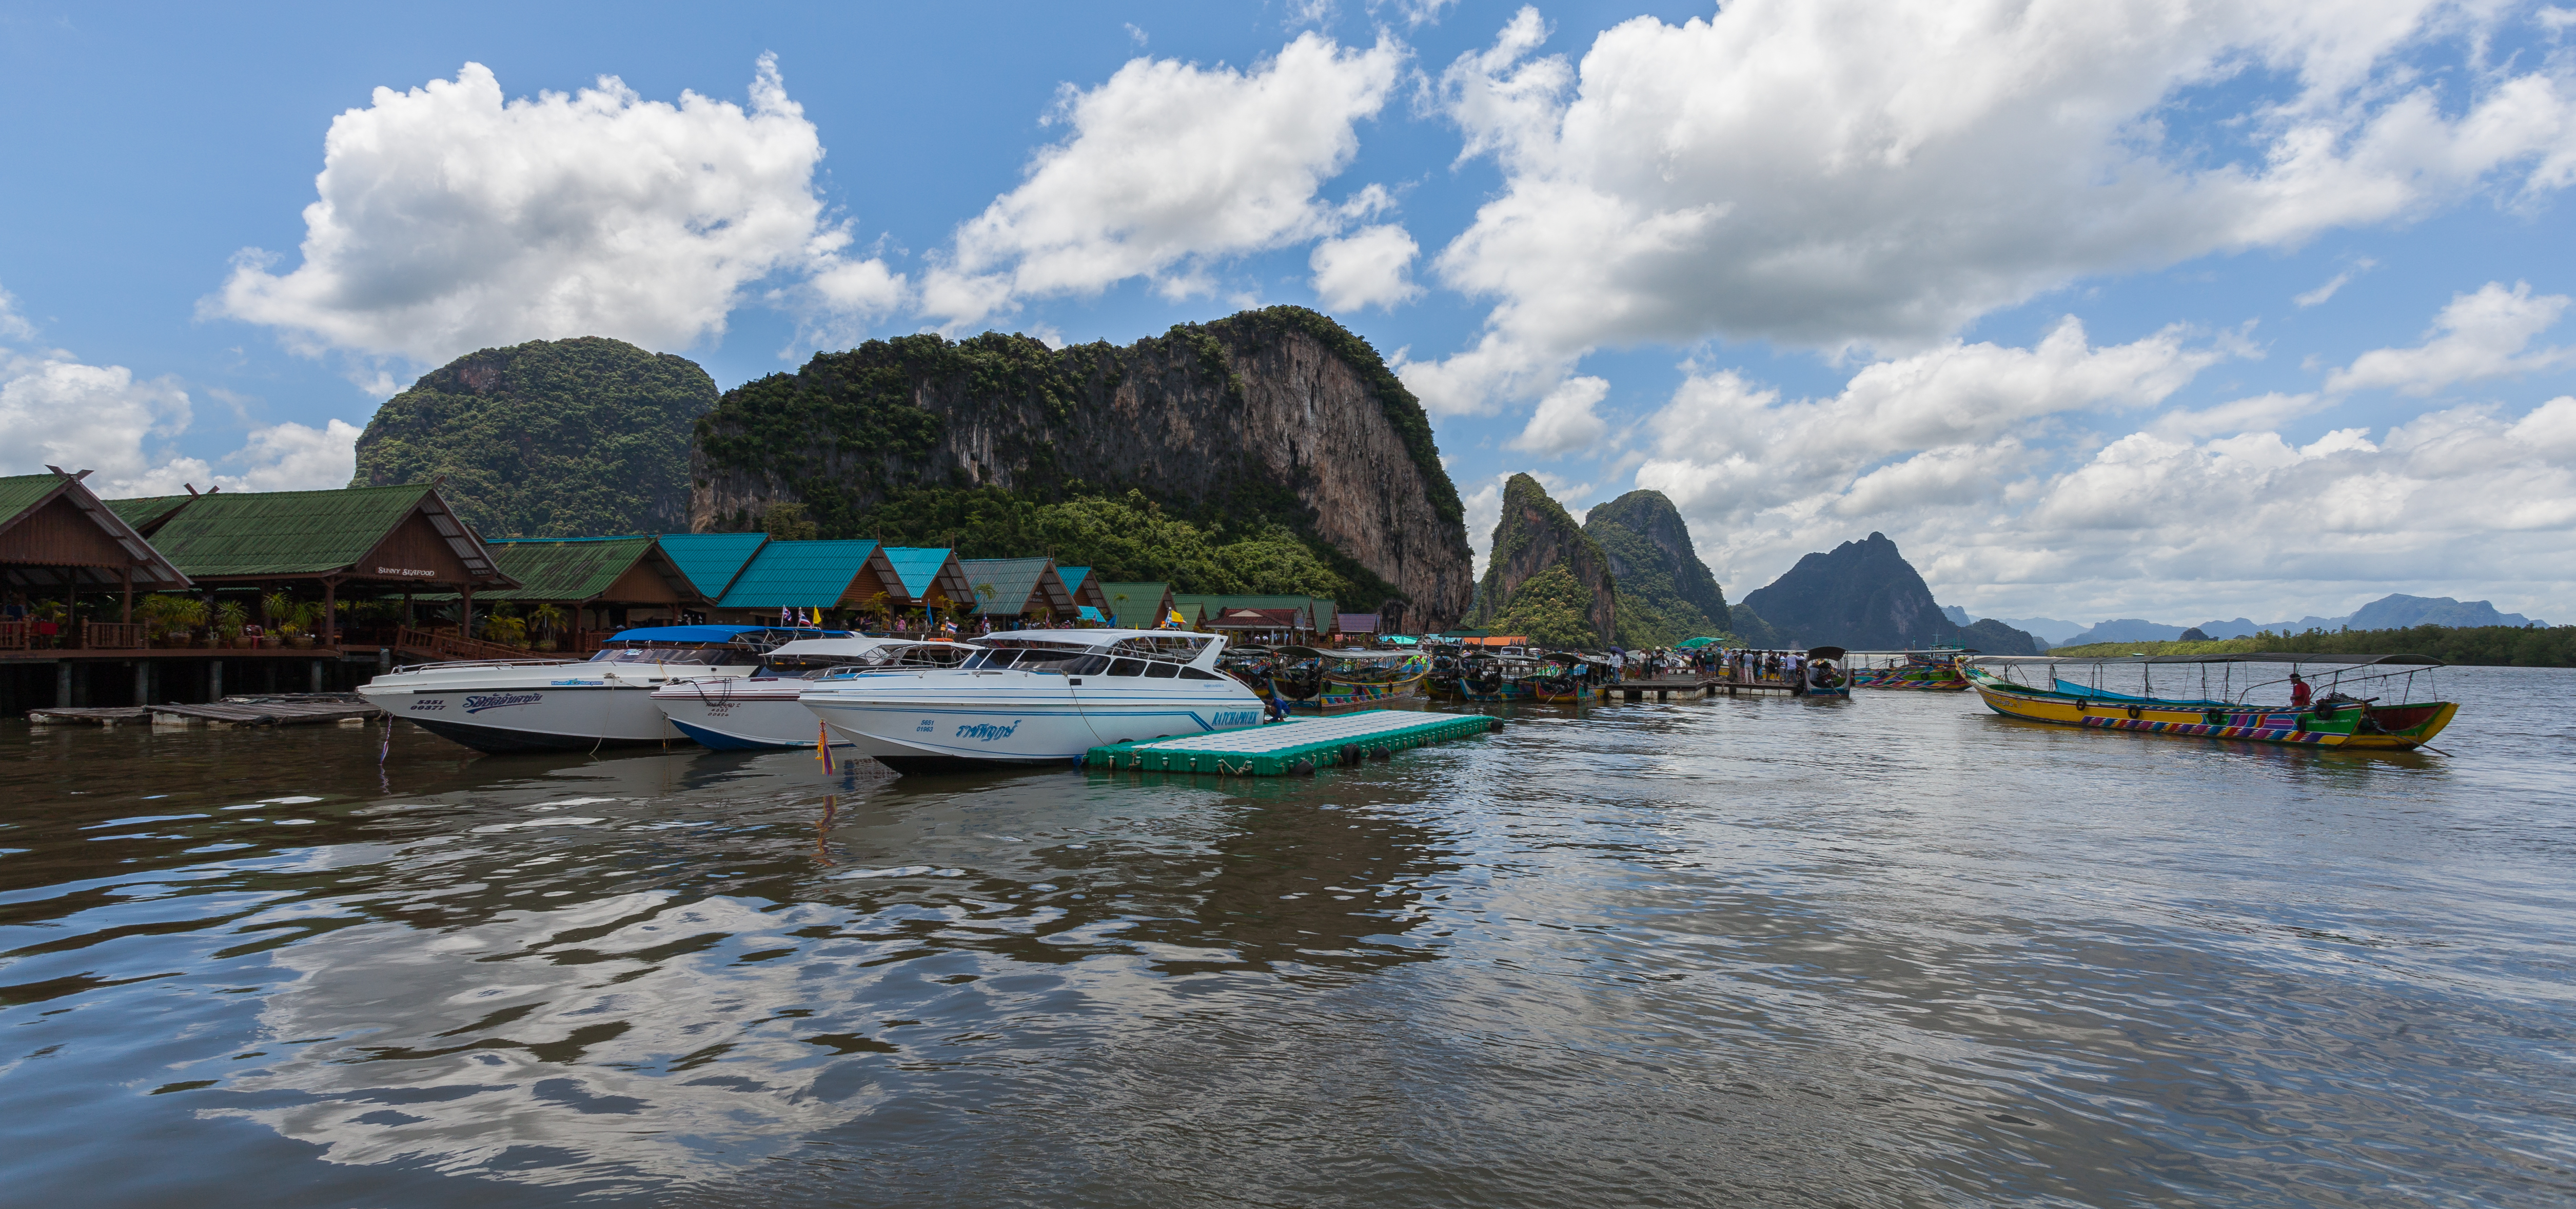 Isla Panyee, Phuket, Tailandia, 2013-08-20, DD 10.JPG